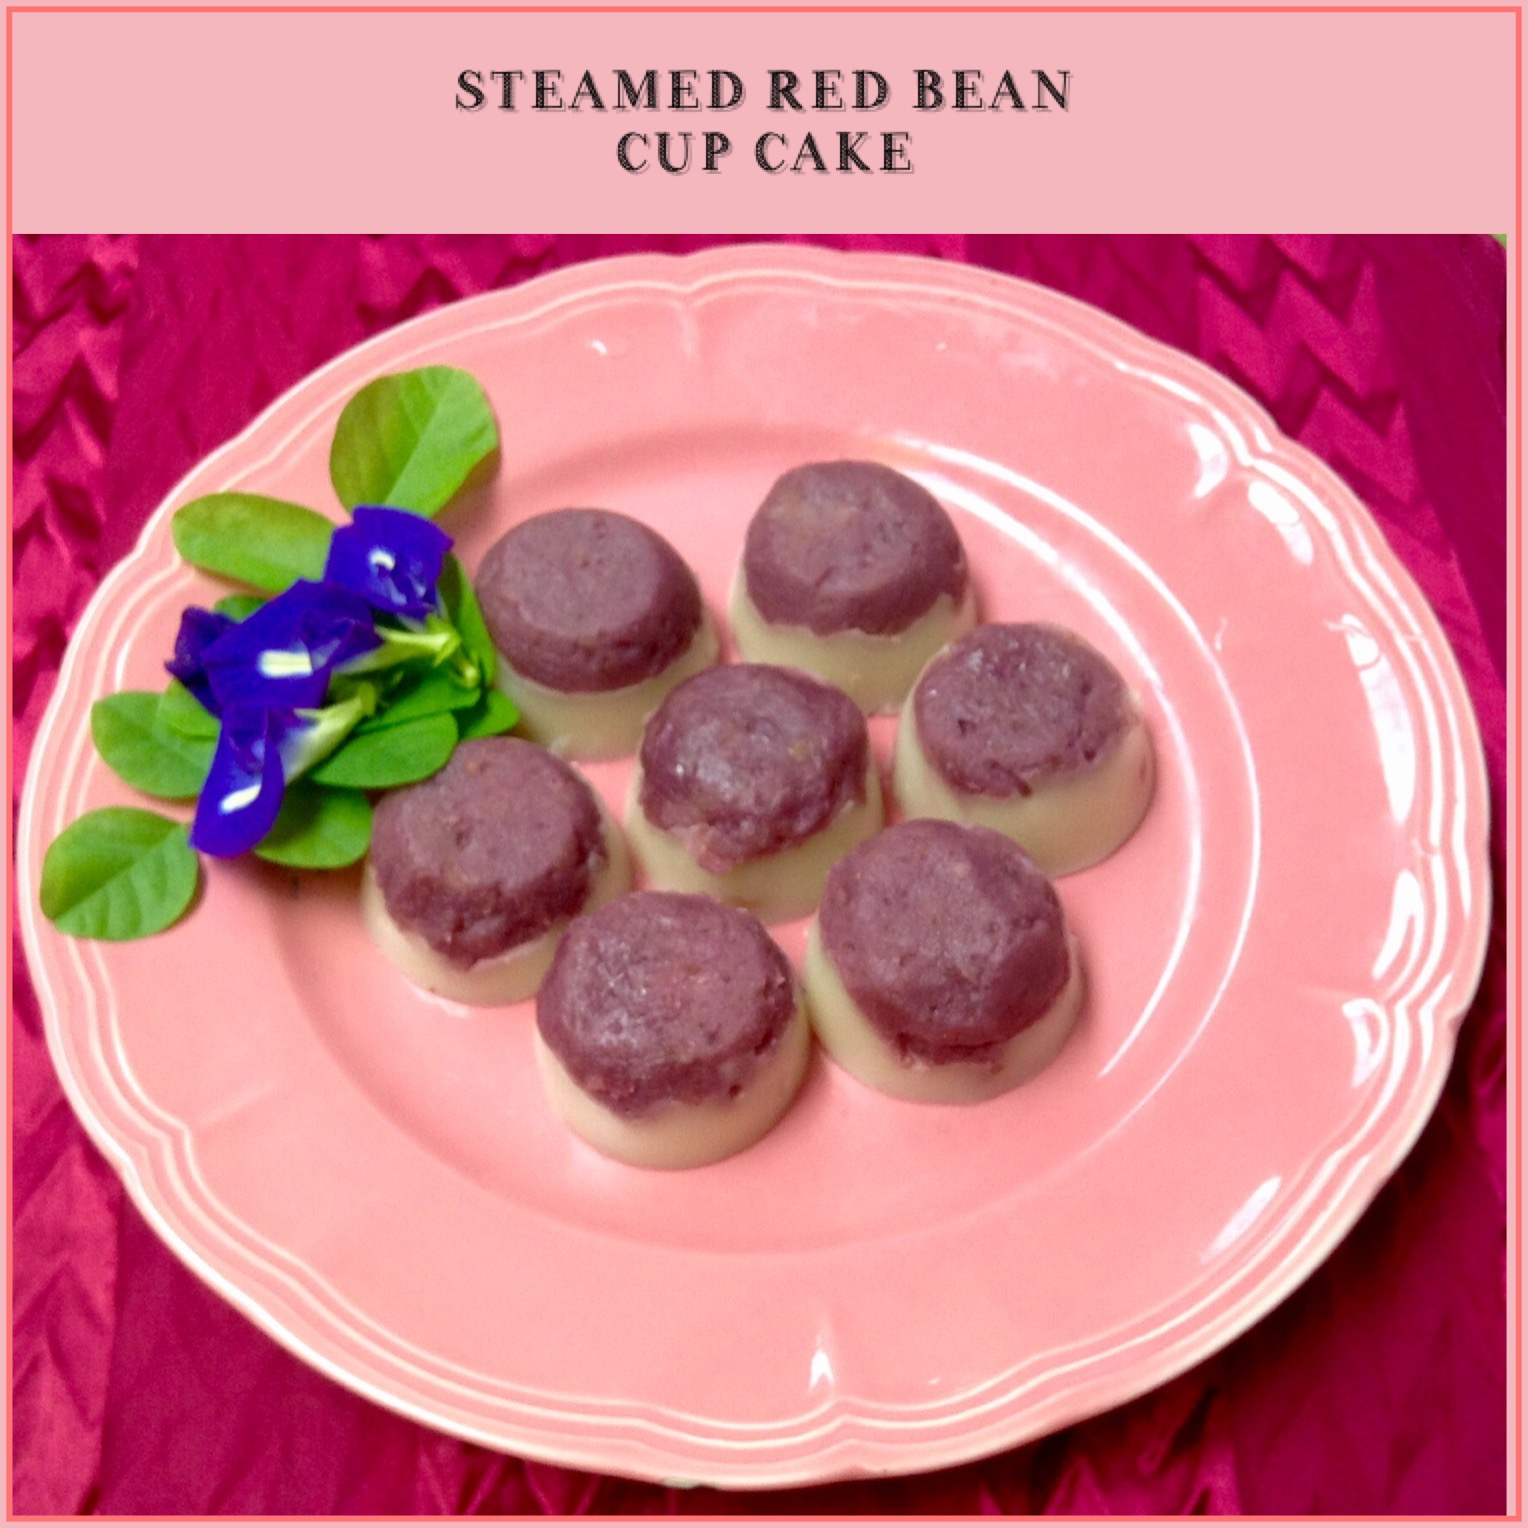 Resep Steamed Red Bean Cupcake